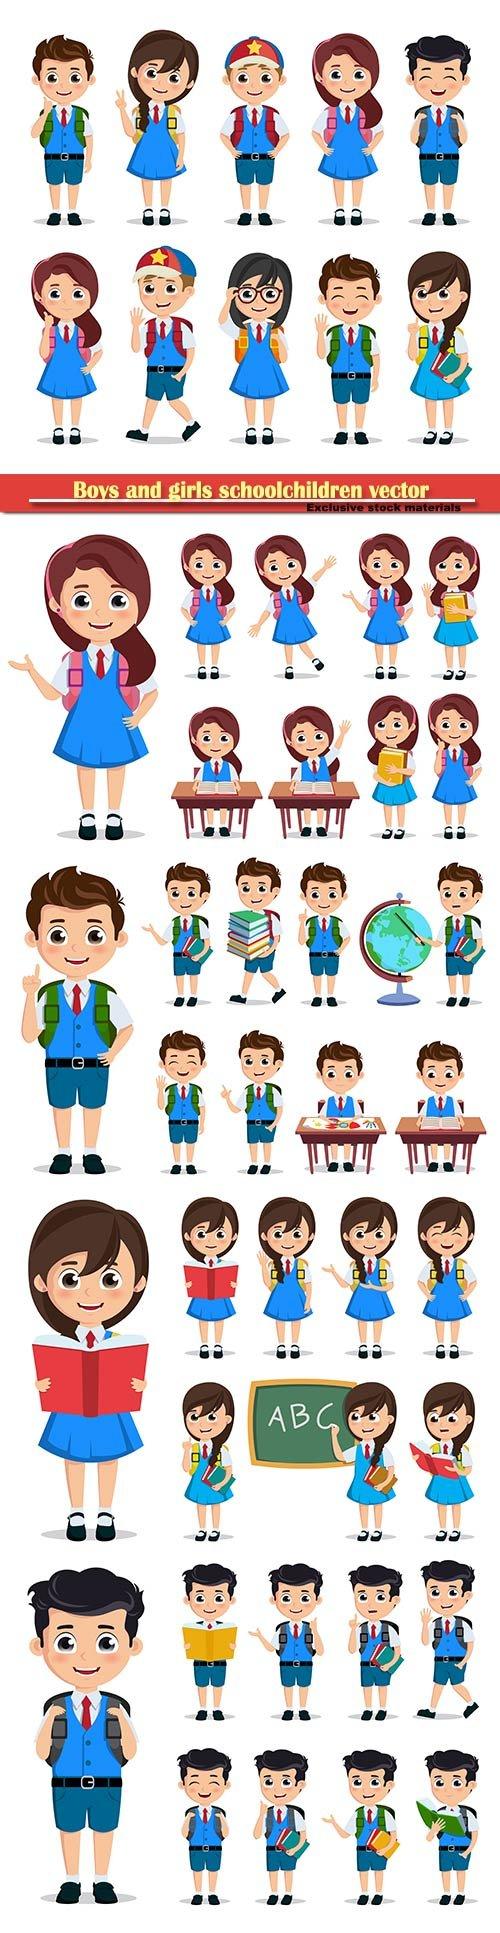 Boys and girls schoolchildren vector illustration